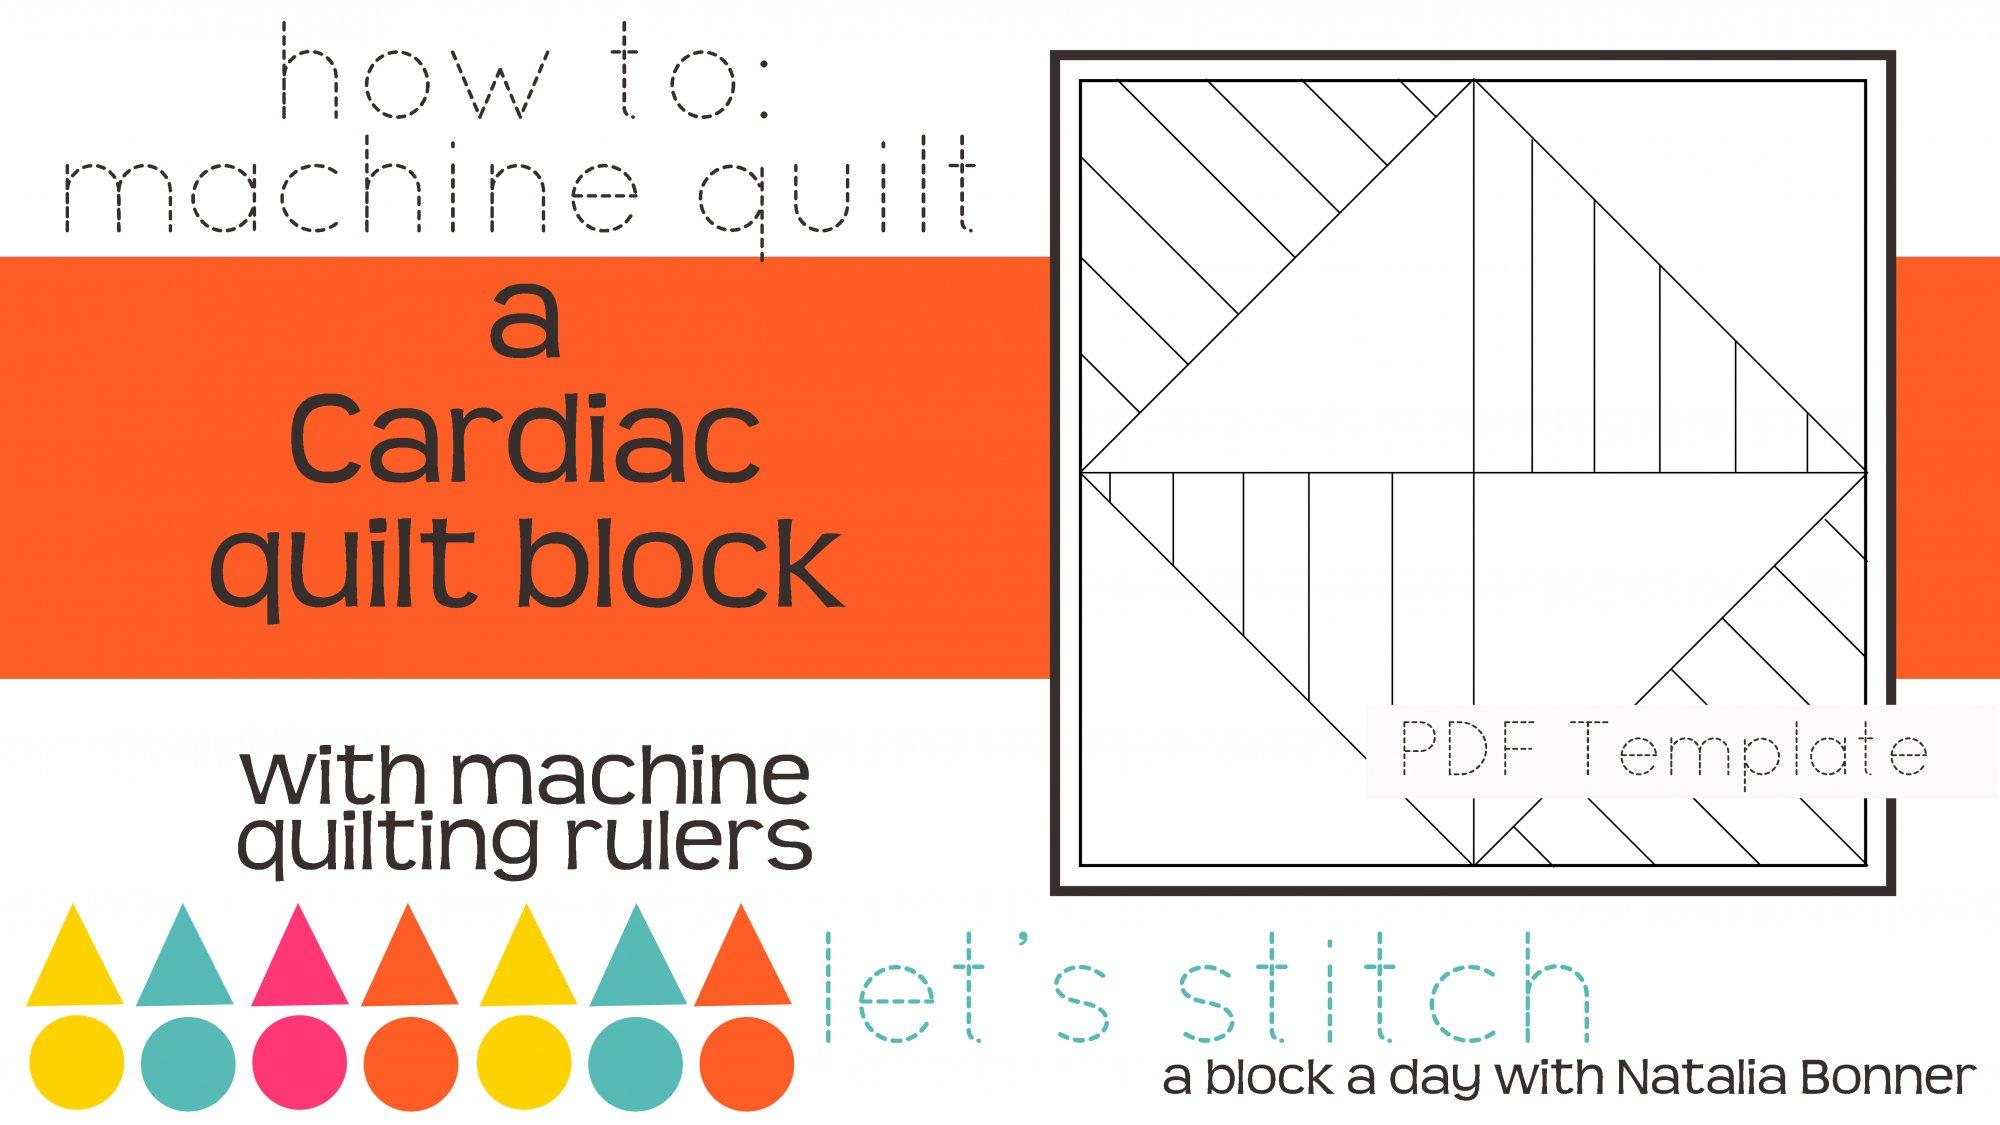 Let's Stitch - A Block a Day With Natalia Bonner - PDF - Cardiac